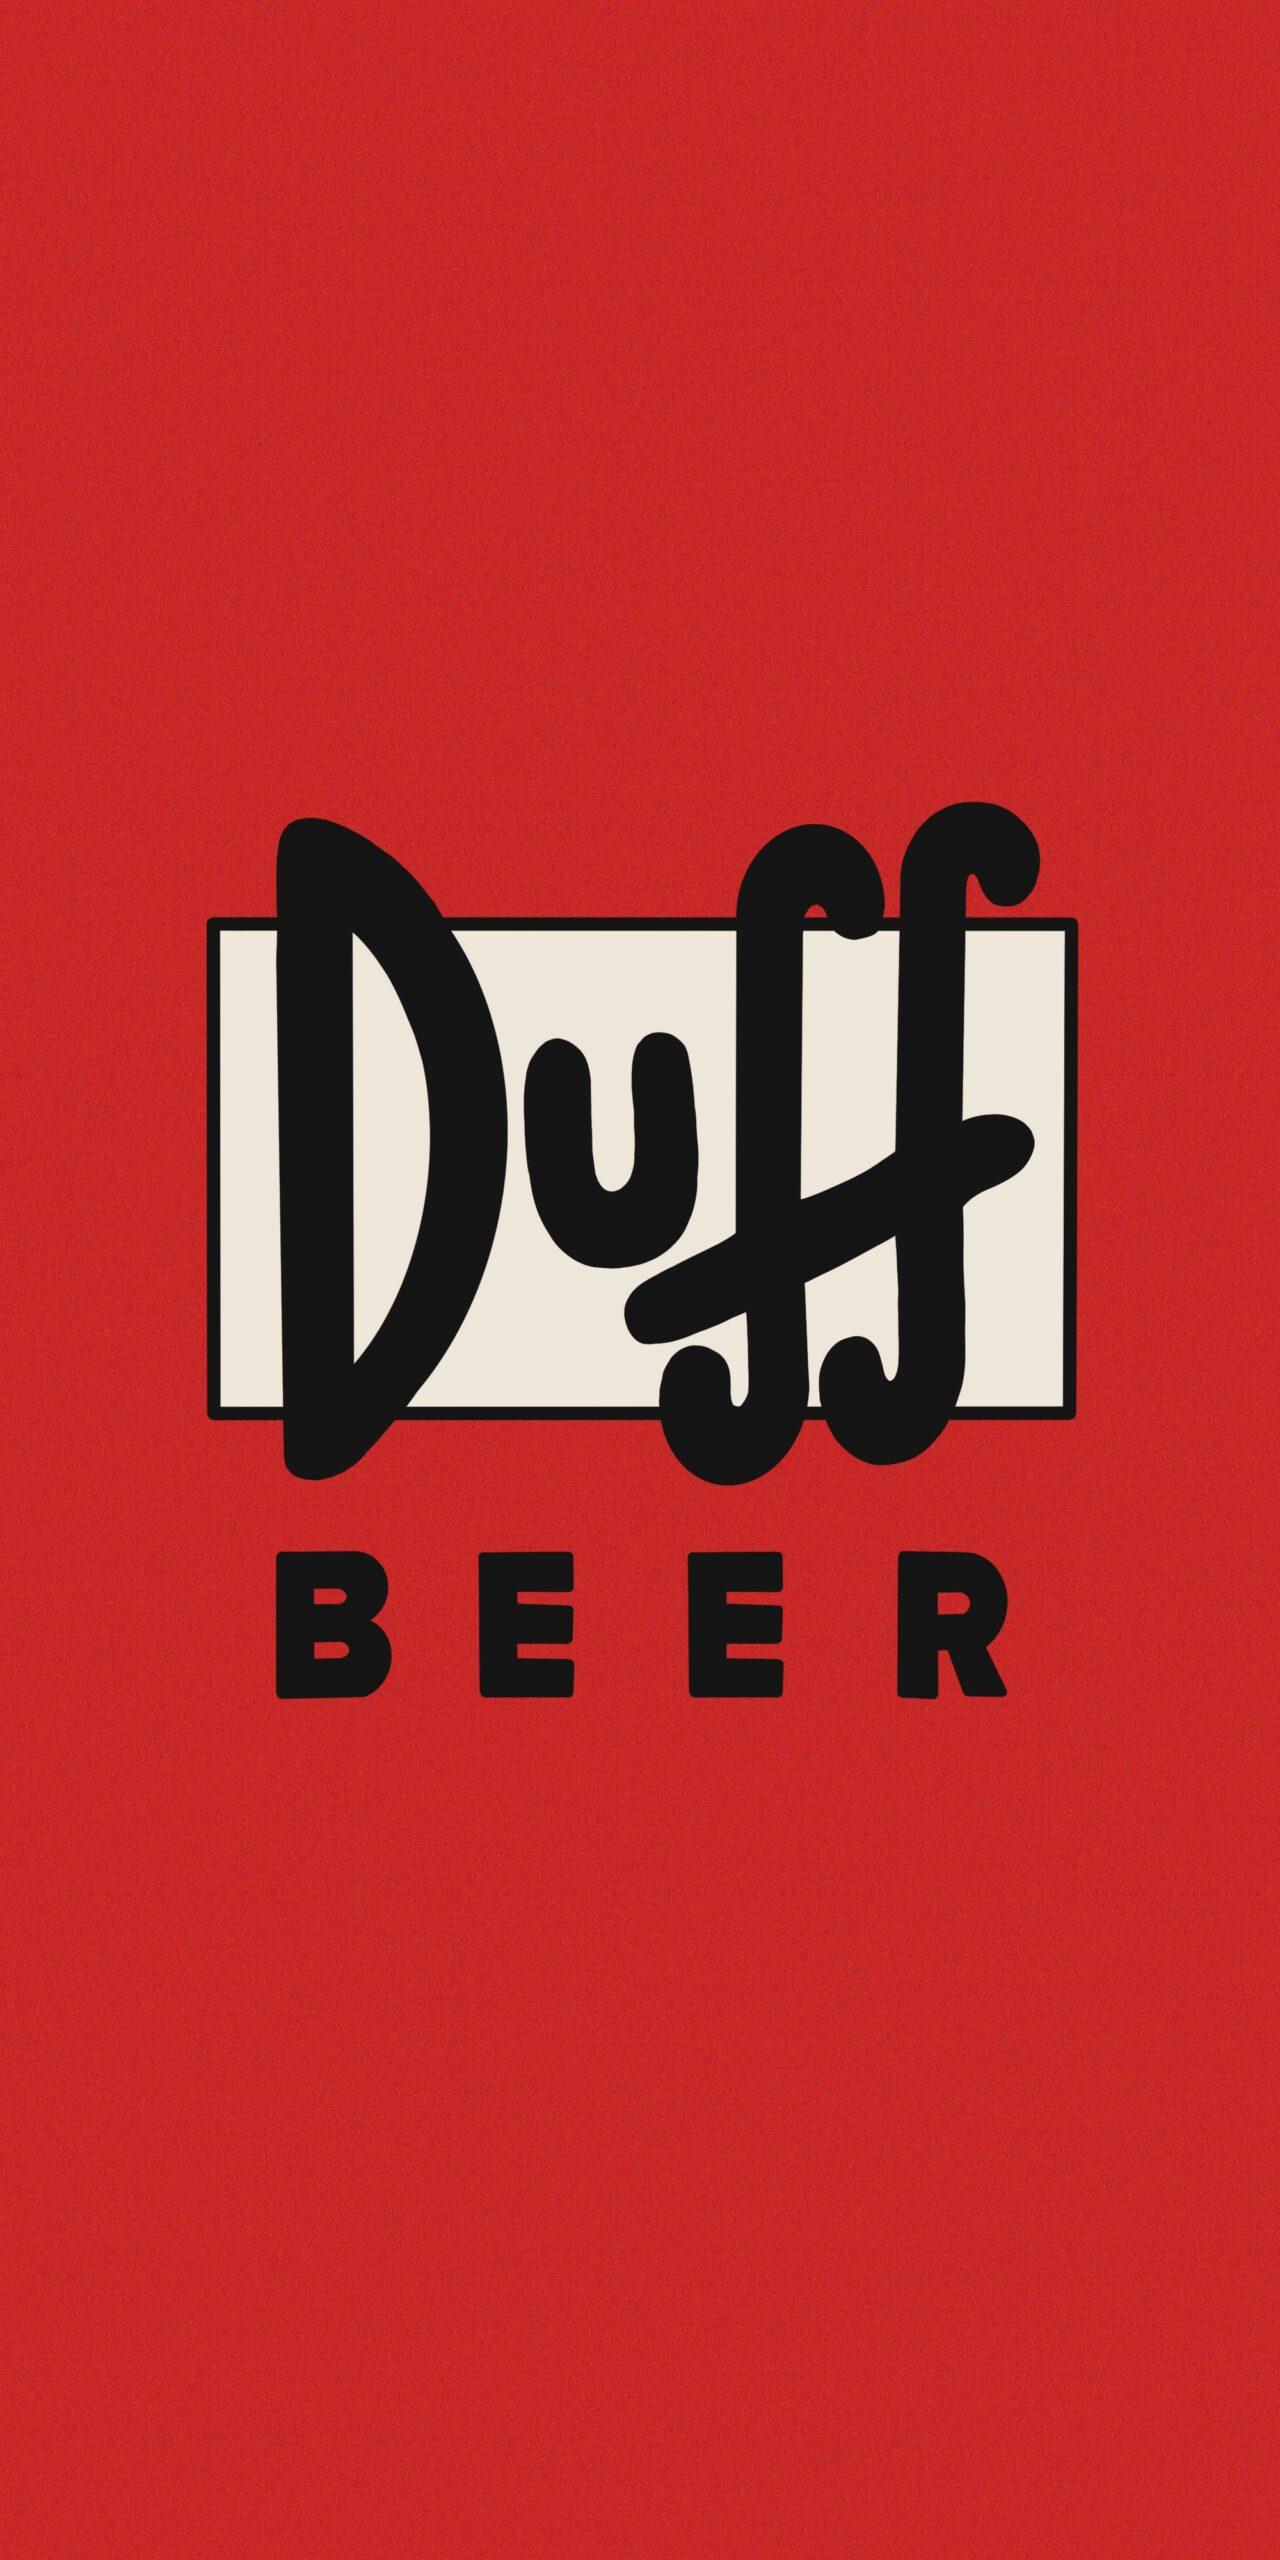 simpsons duff beer logo red wallpaper